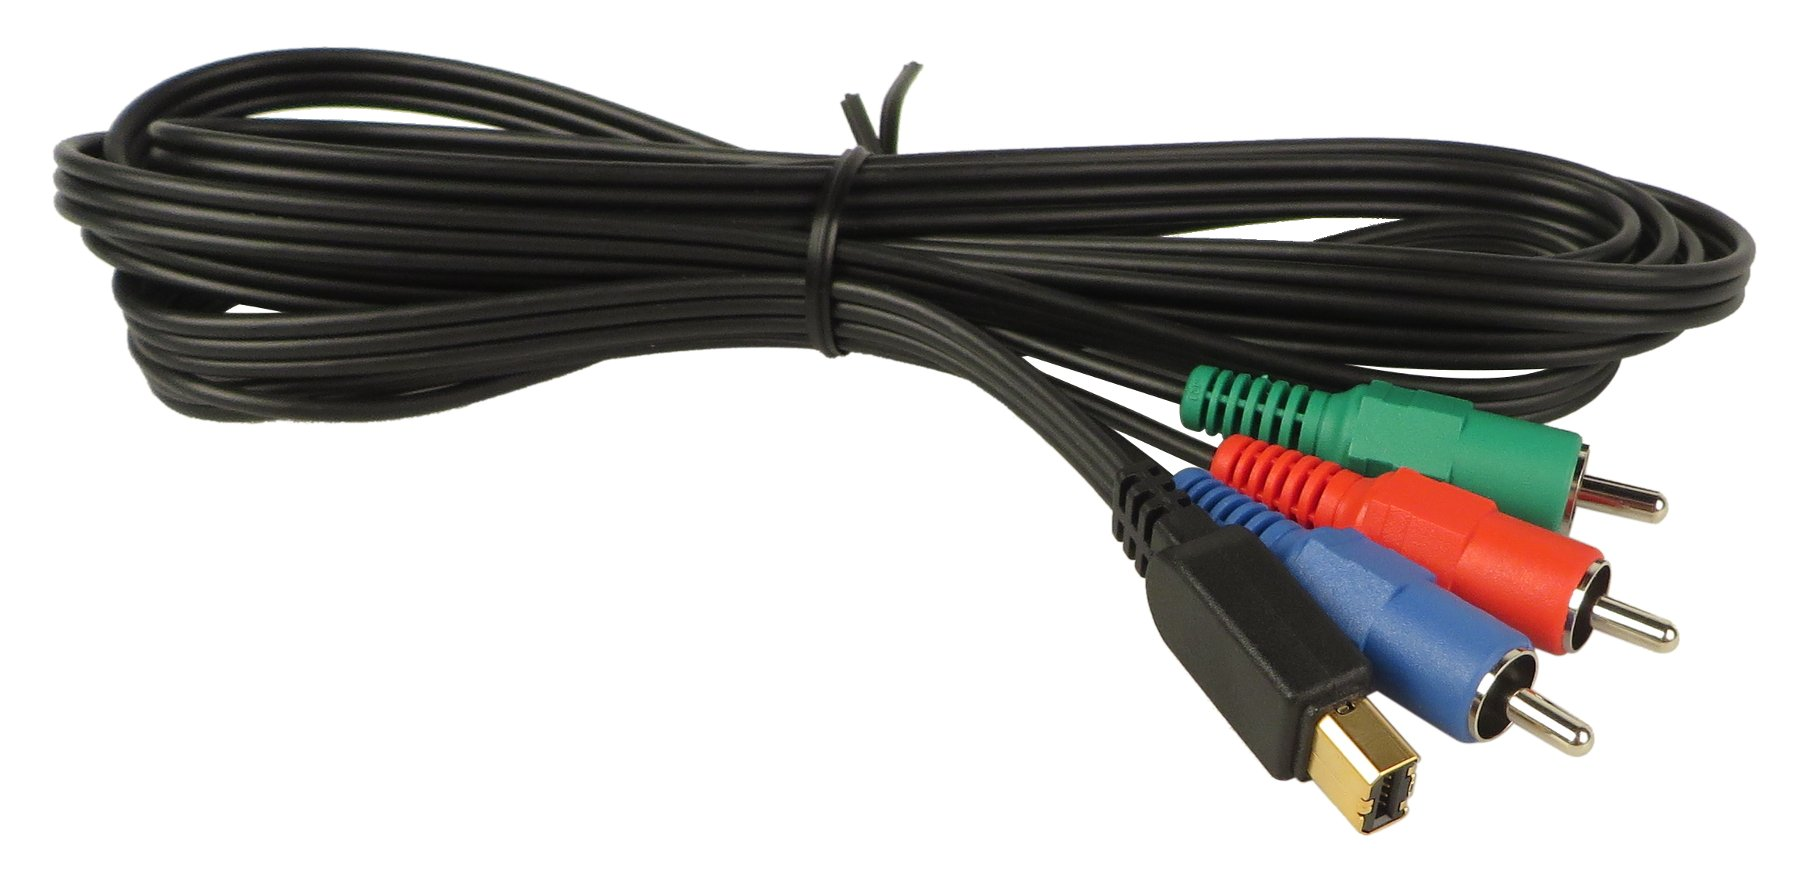 Panasonic K2KZ9DB00004 Panasonic Camcorders Component Cable K2KZ9DB00004